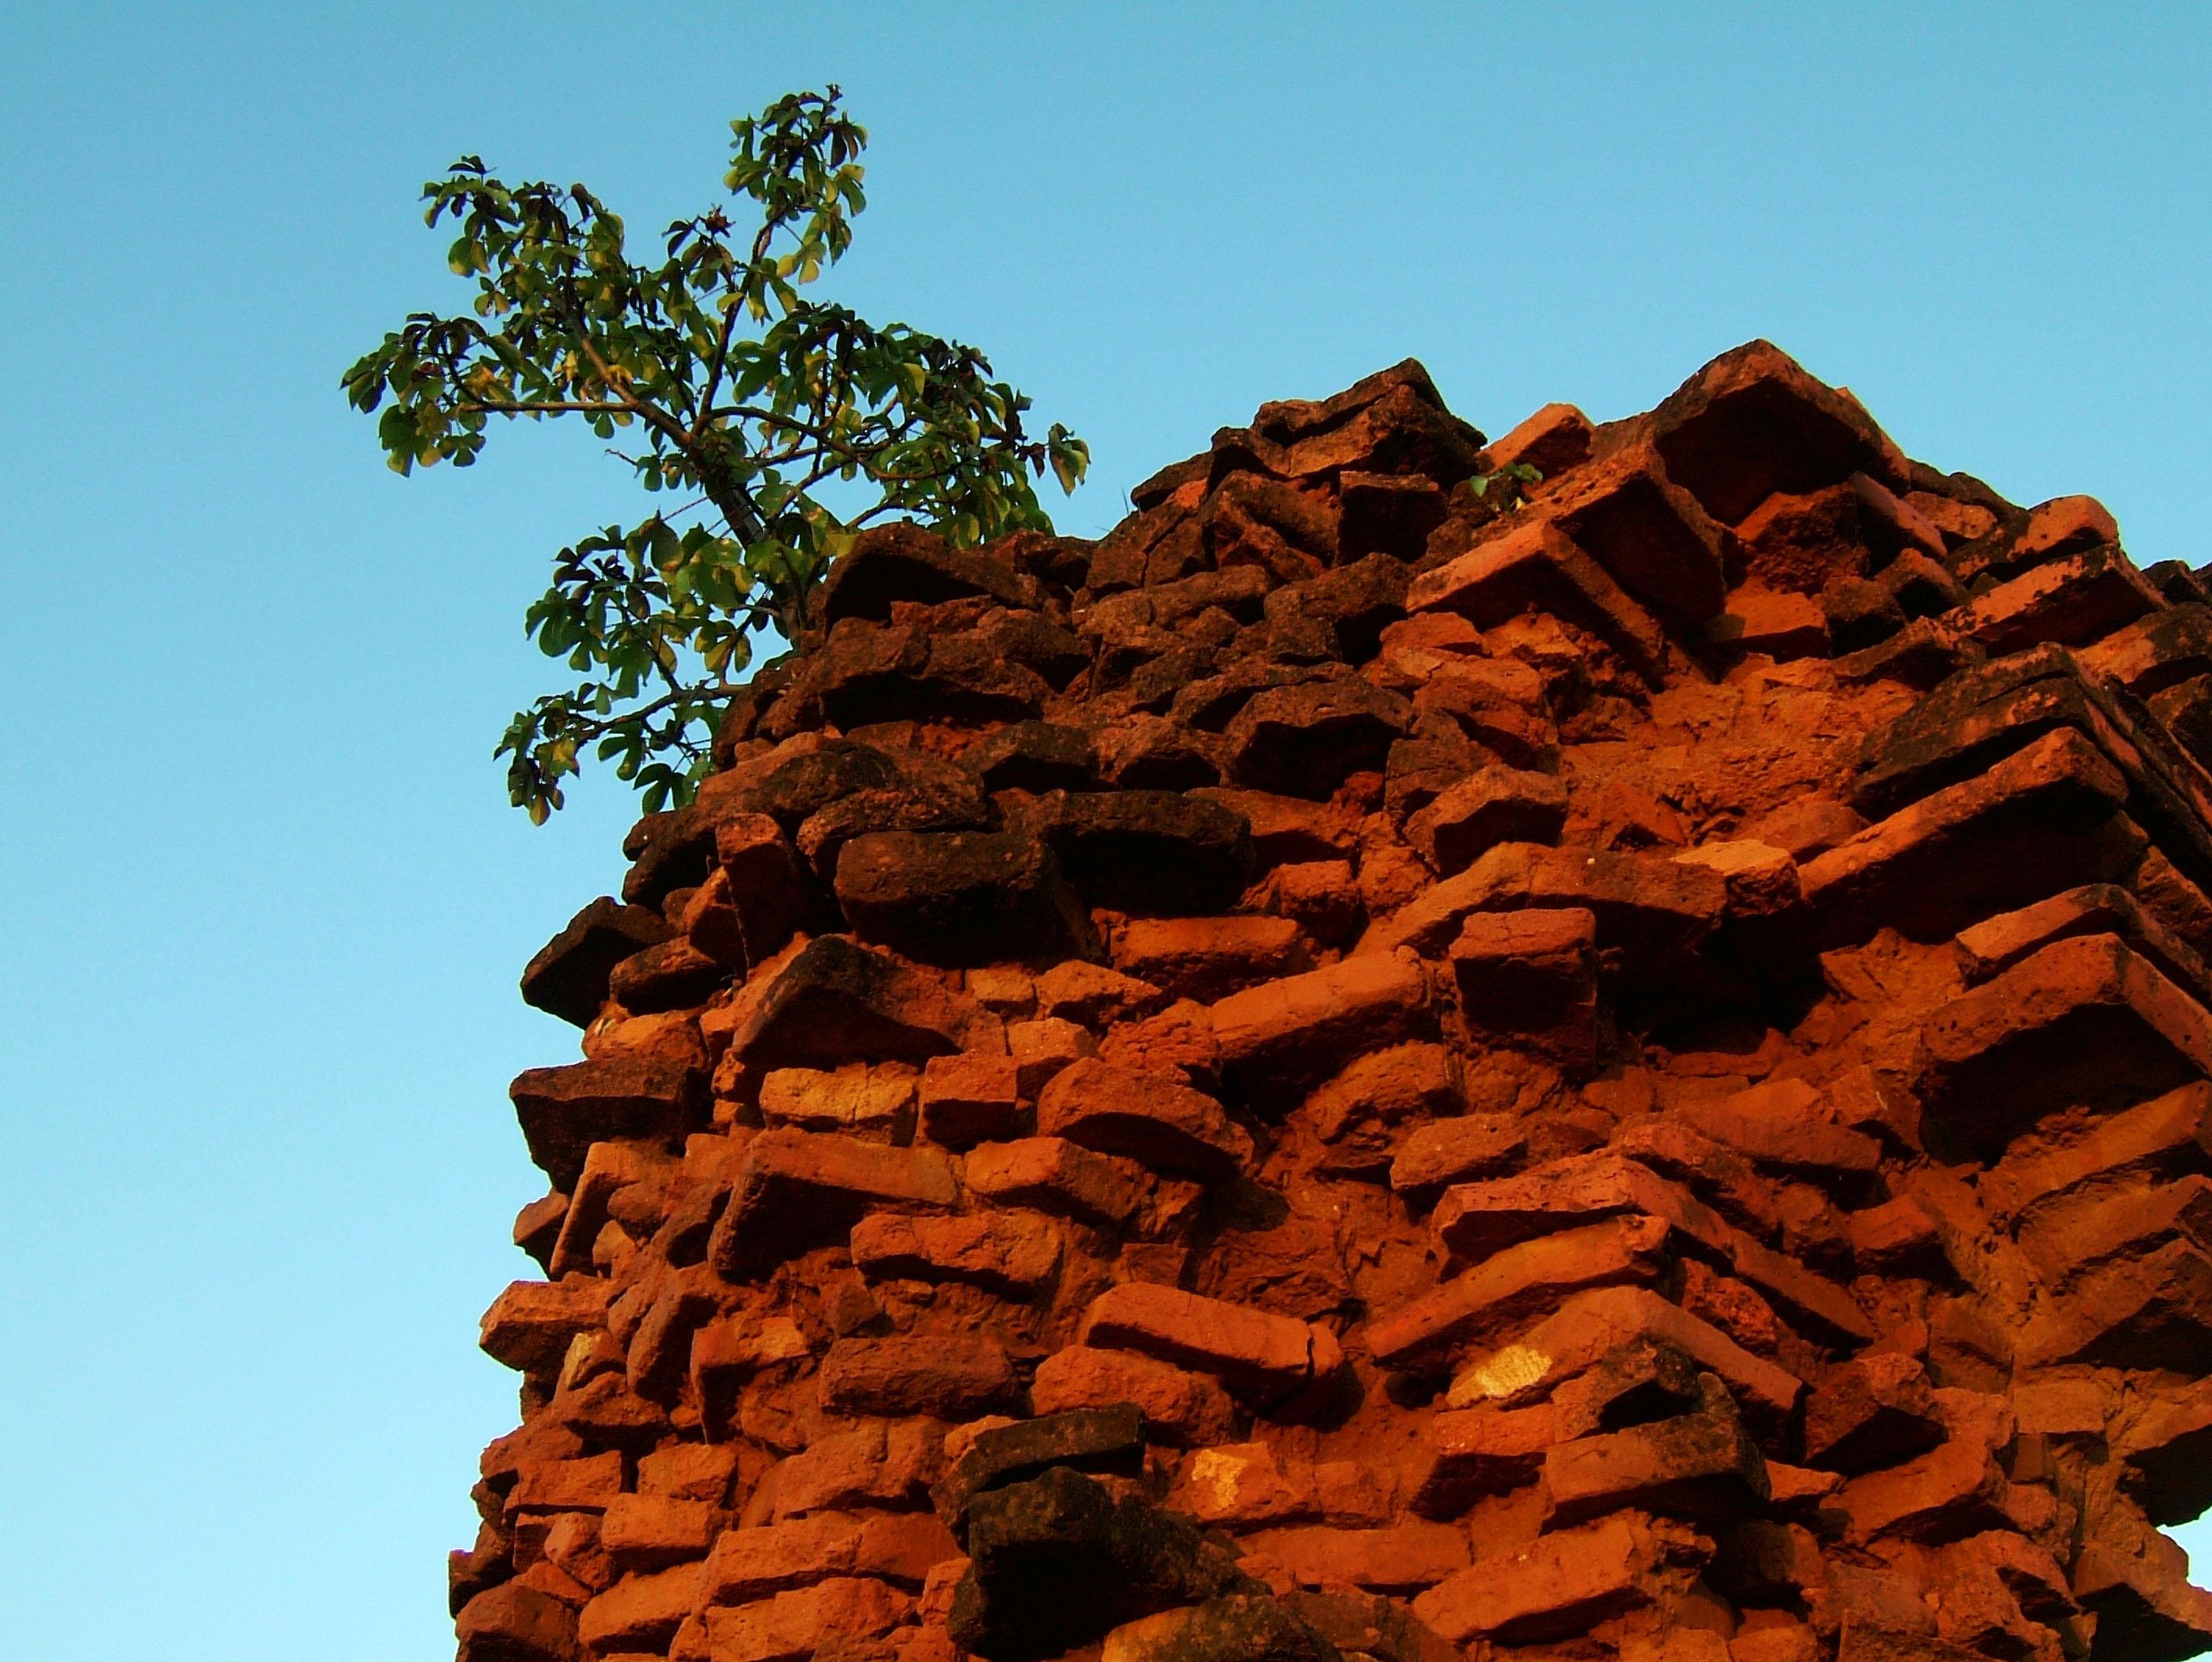 Textures Brickwork clay bricks Pagan 02